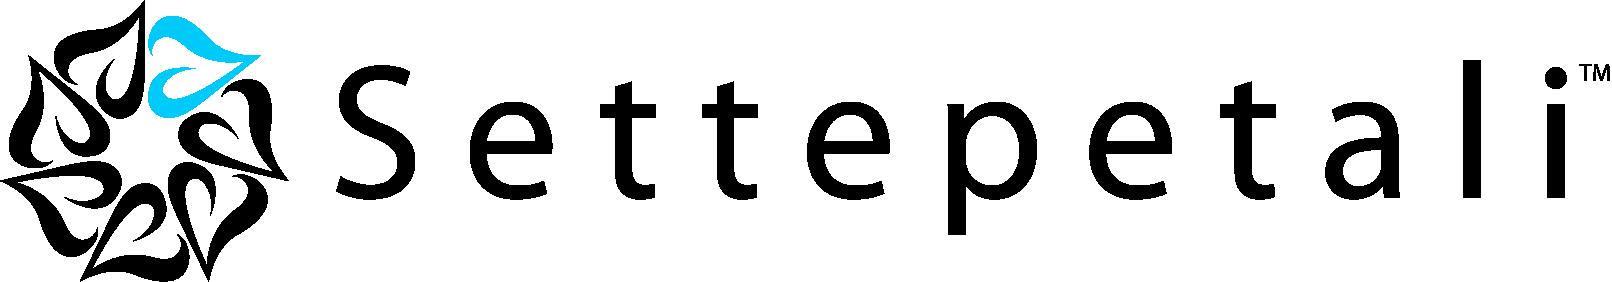 SETTEPETALI